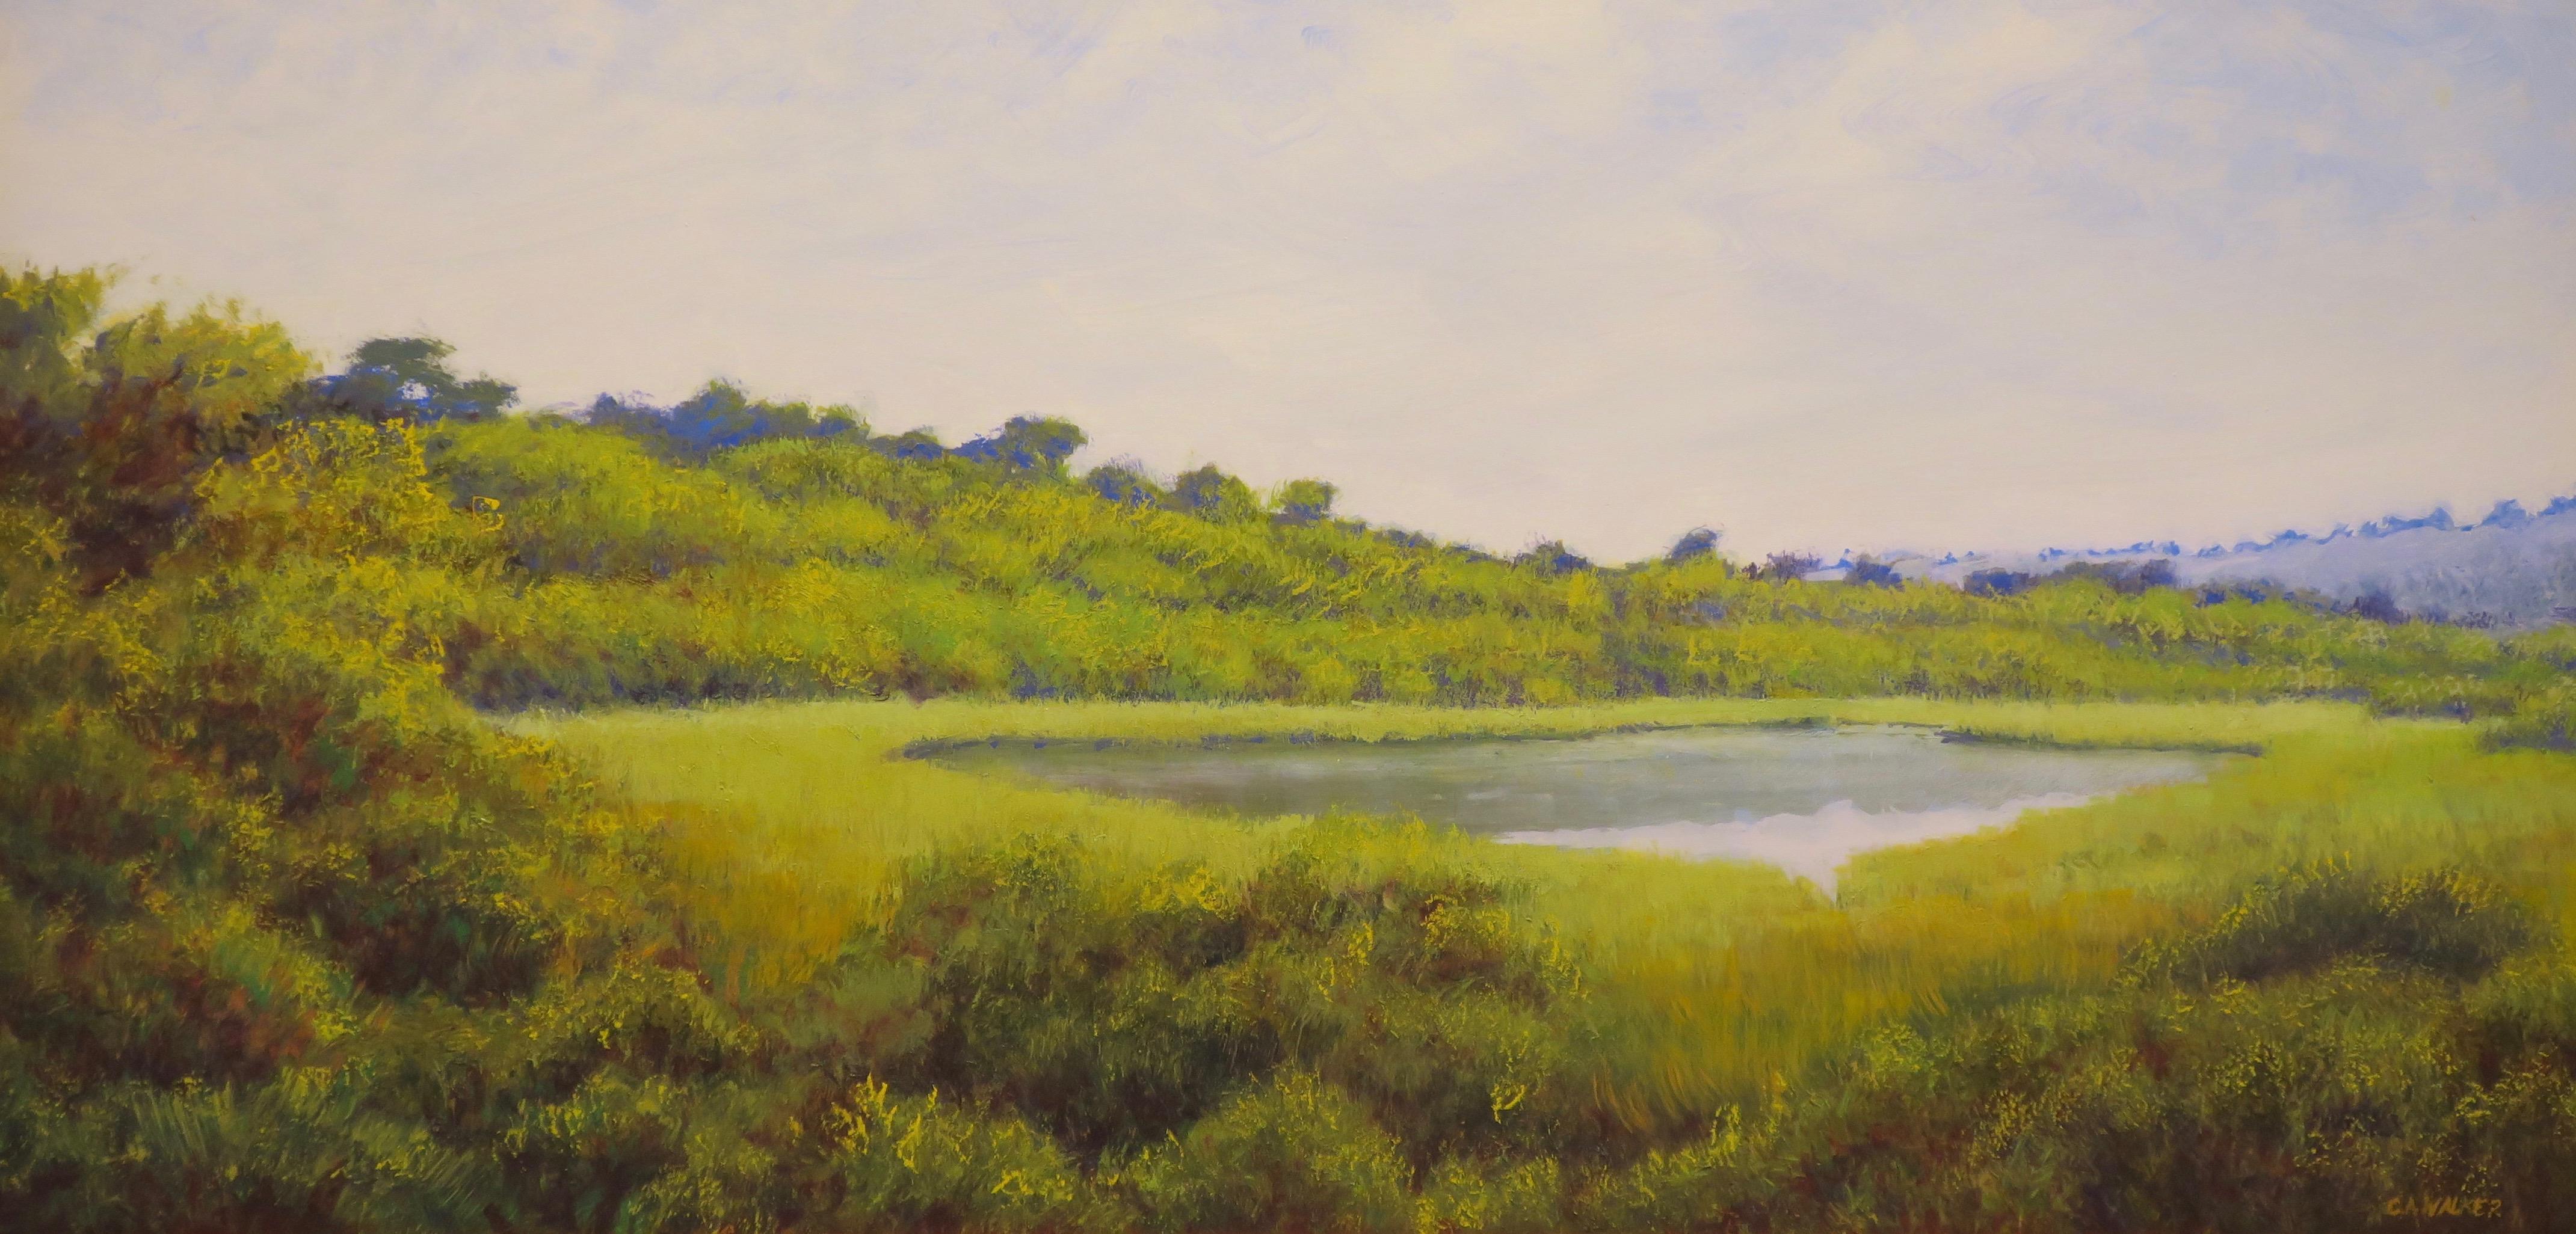 Pout's Pond